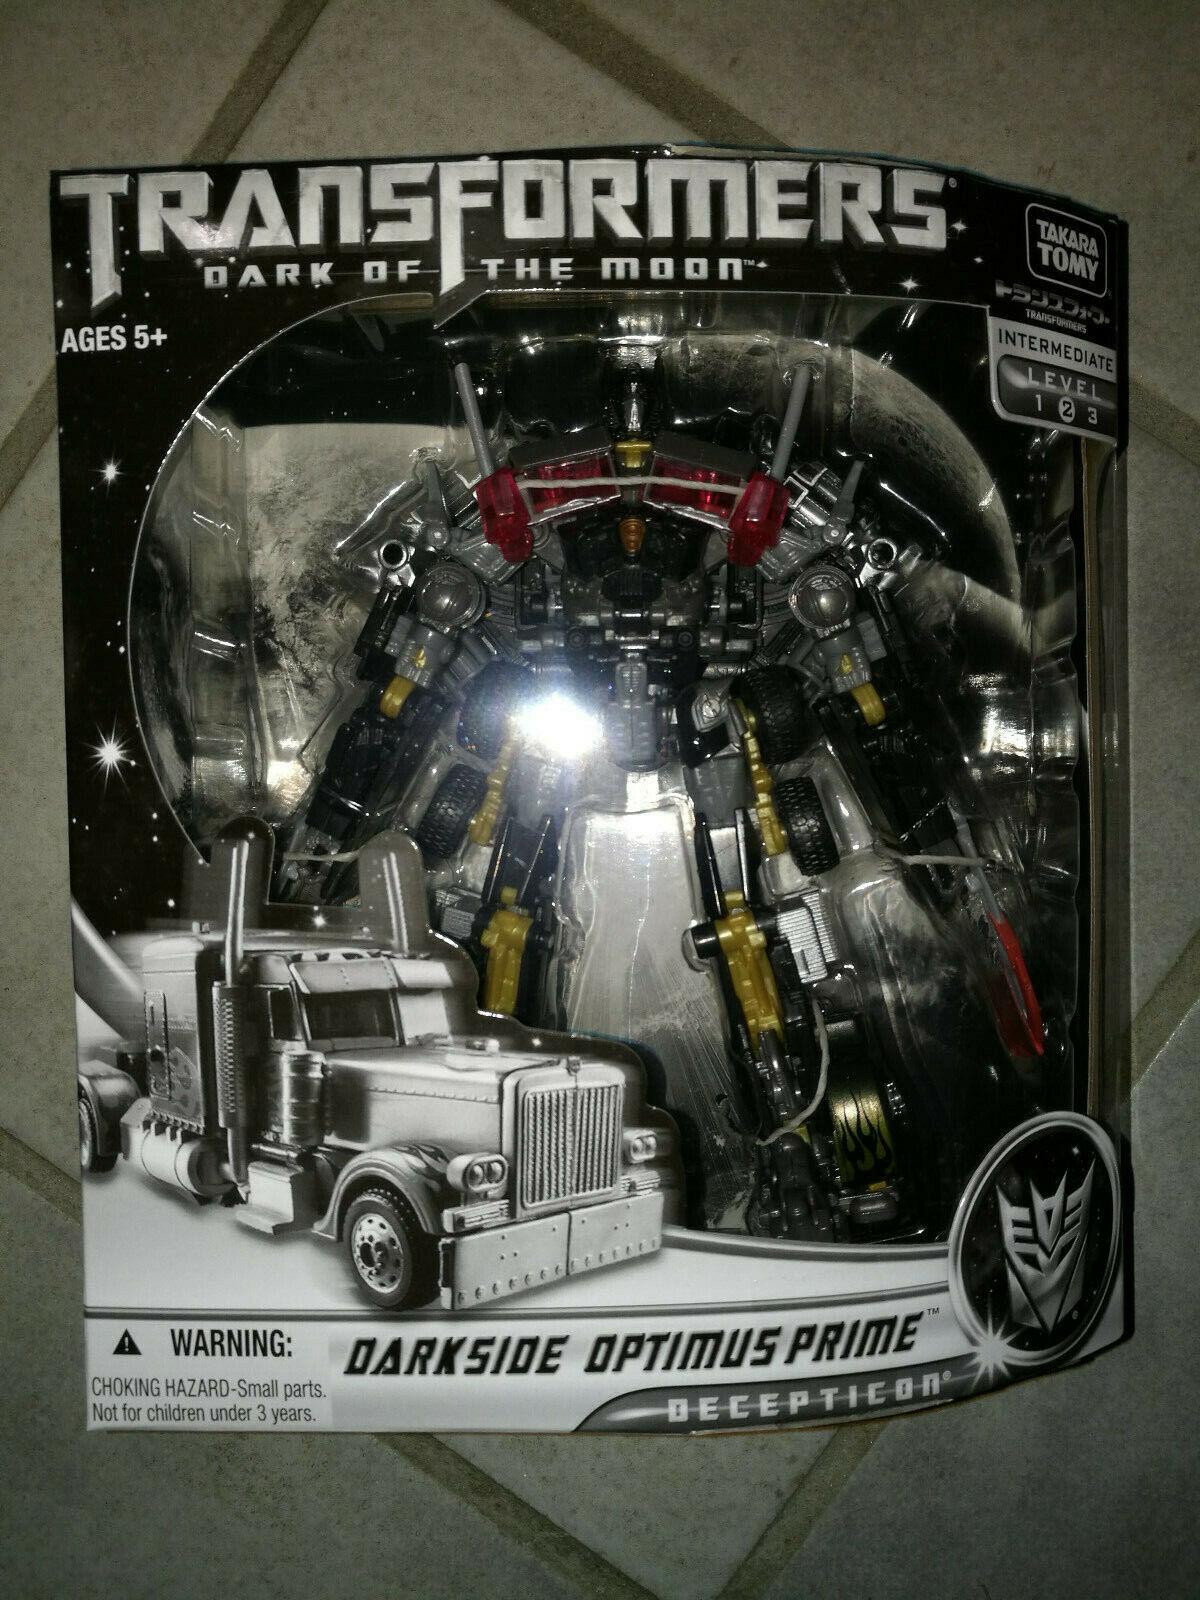 Transformers Darkside Optimus Prime Lawson Limited Takara Japan